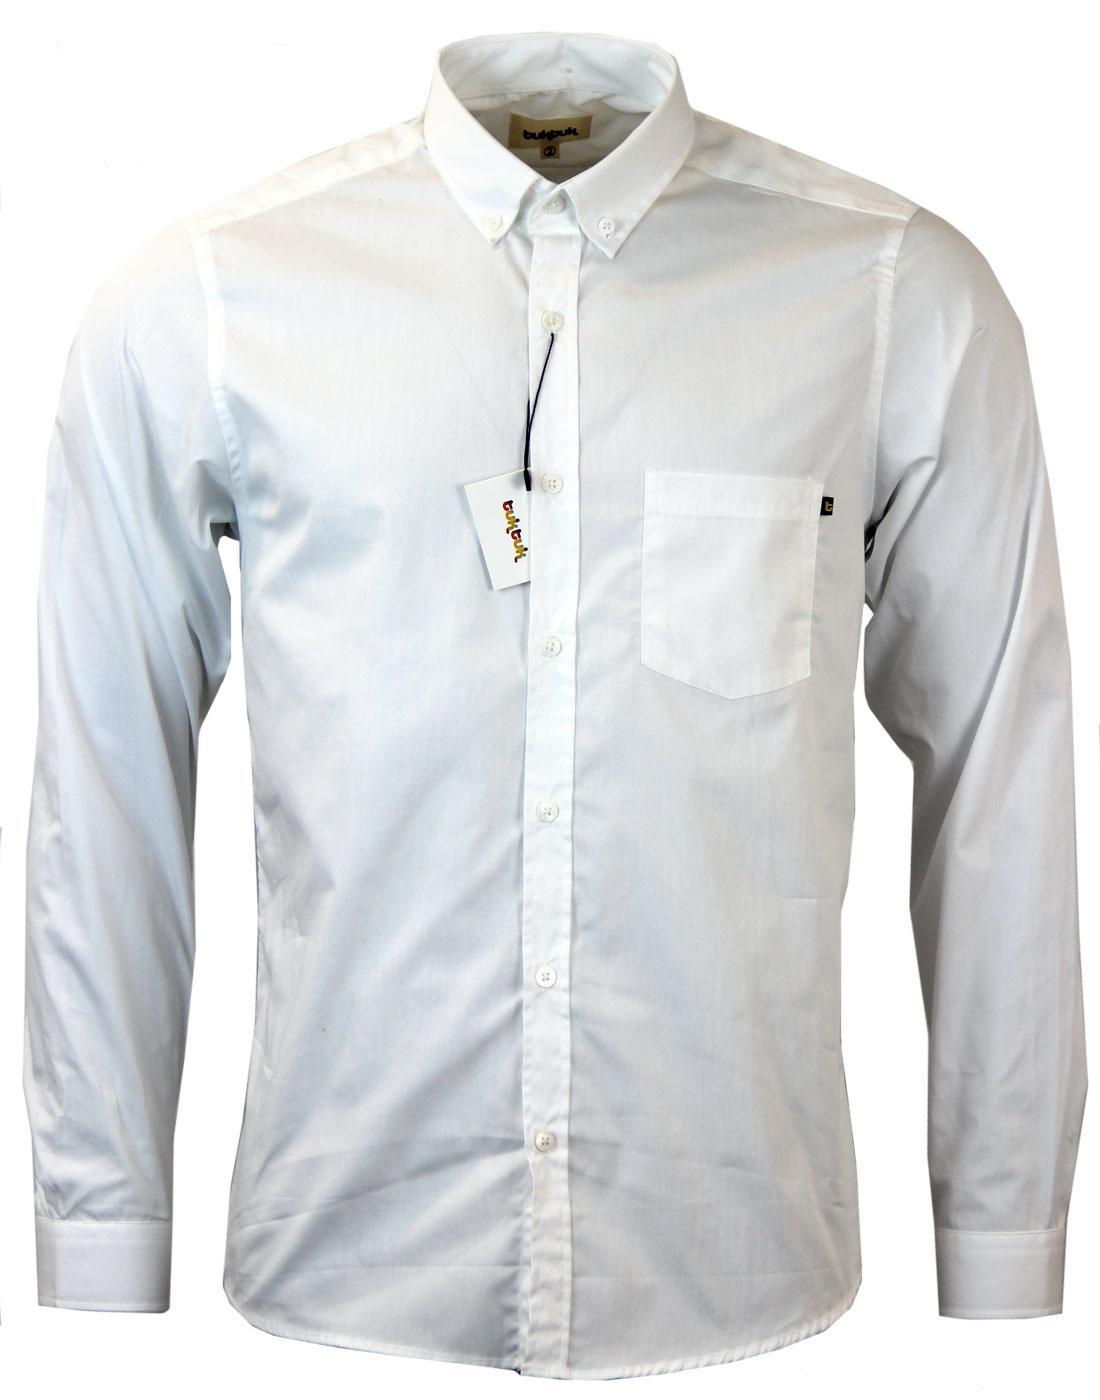 Agnew TUKTUK Retro Mod Cotton Poplin L/S Shirt (W)